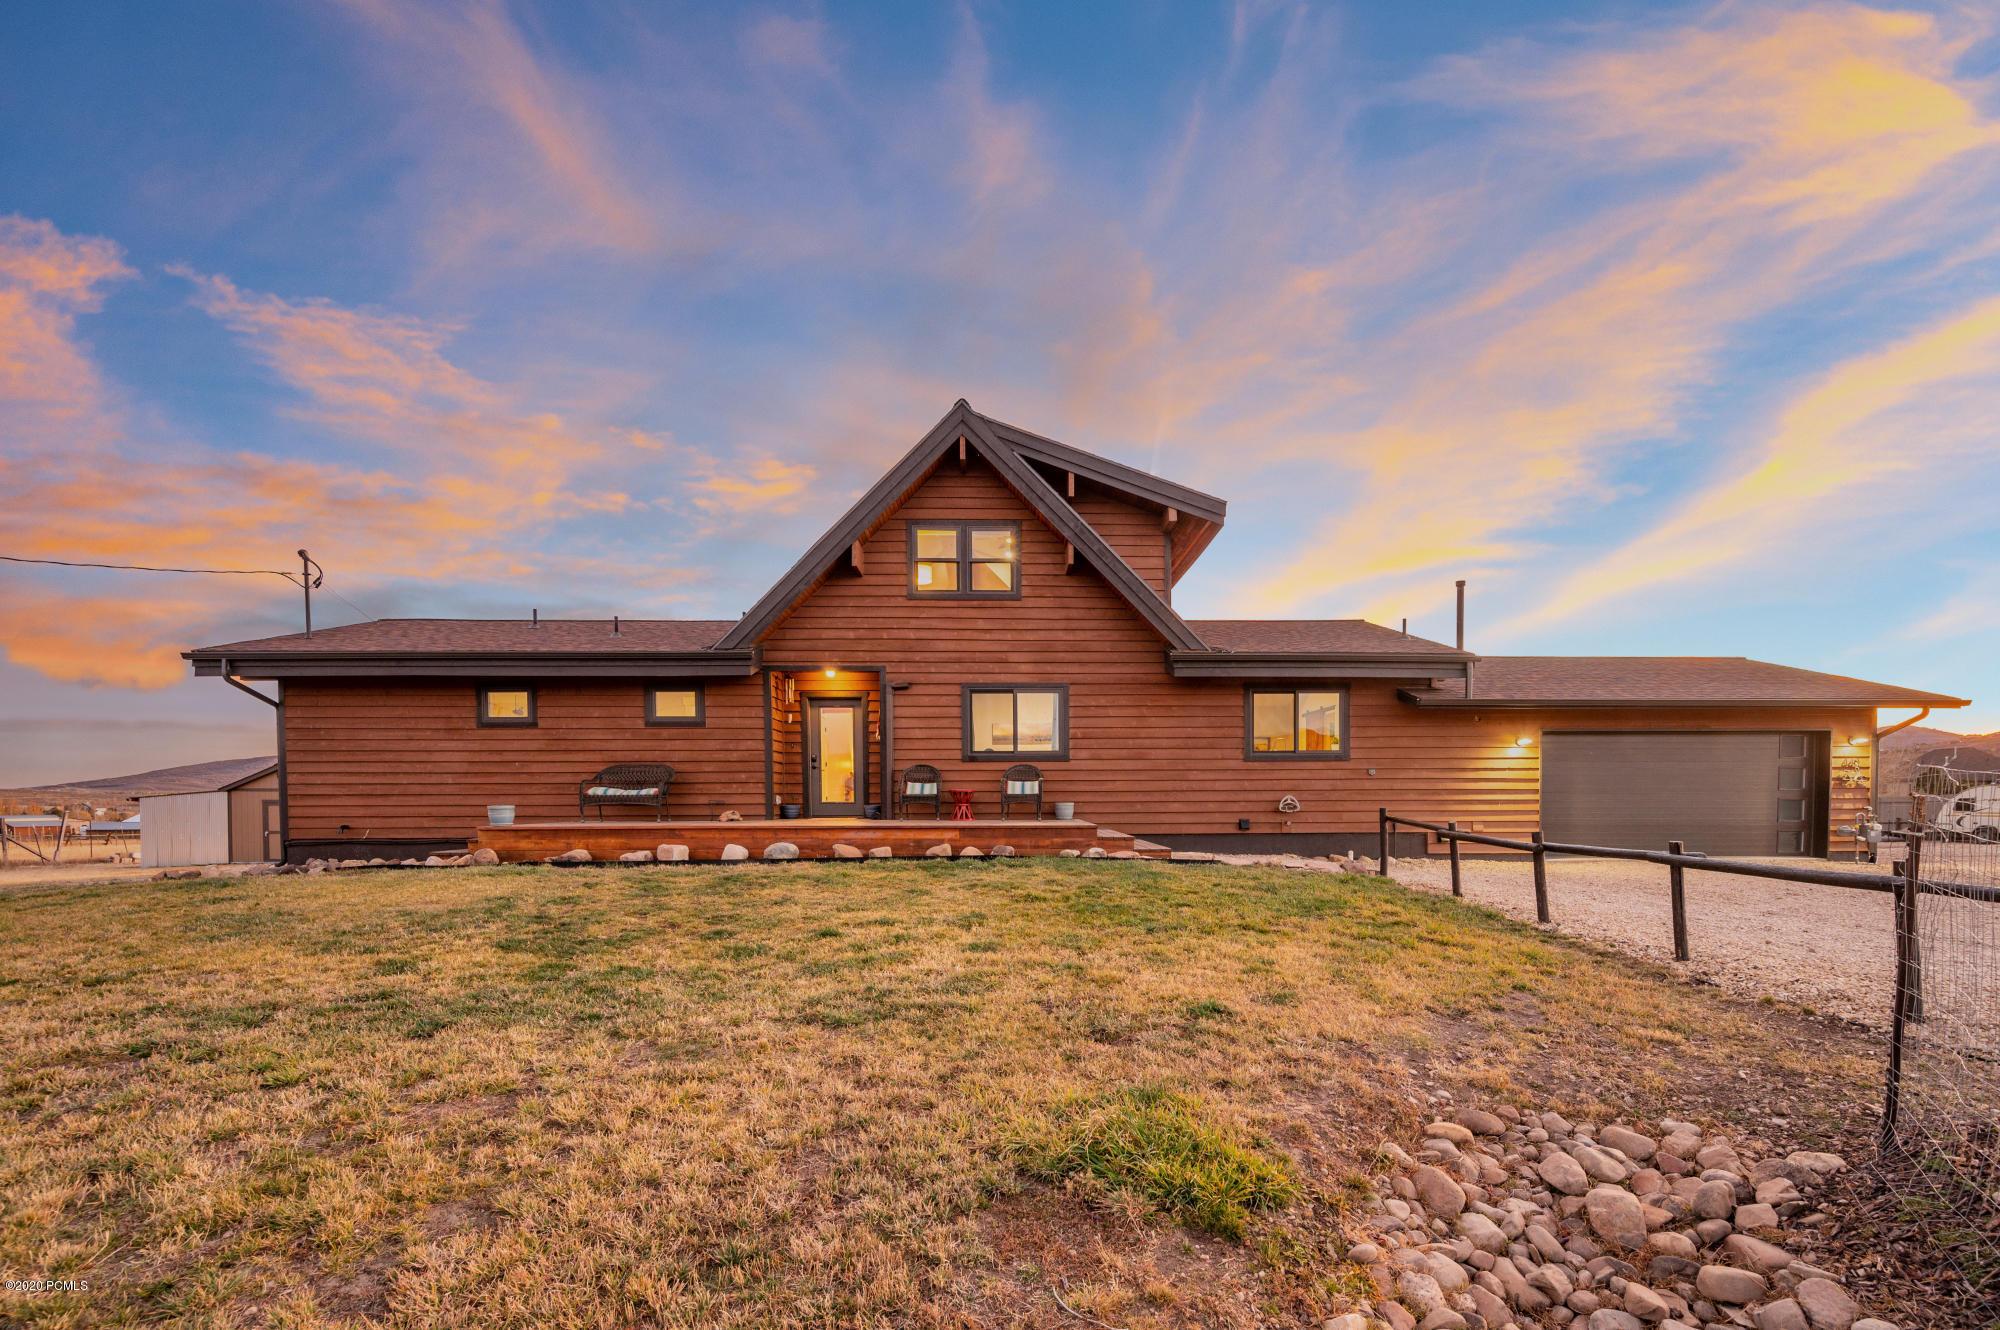 440 Wasatch Way, Park City, Utah 84098, 5 Bedrooms Bedrooms, ,4 BathroomsBathrooms,Single Family,For Sale,Wasatch,12004119